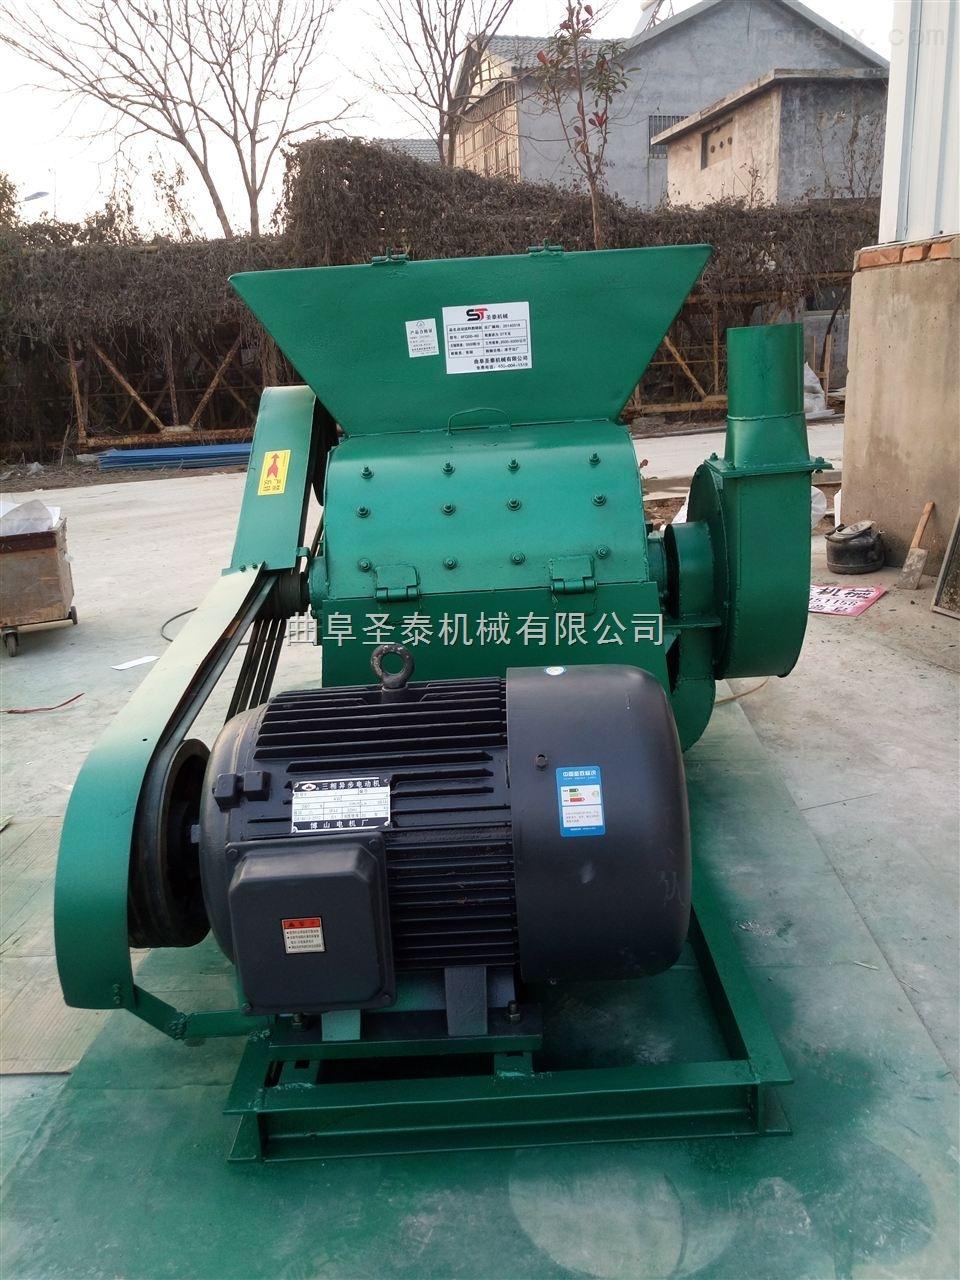 9FQ50-50-稻草粉碎机 秸秆粉碎机多少钱一台